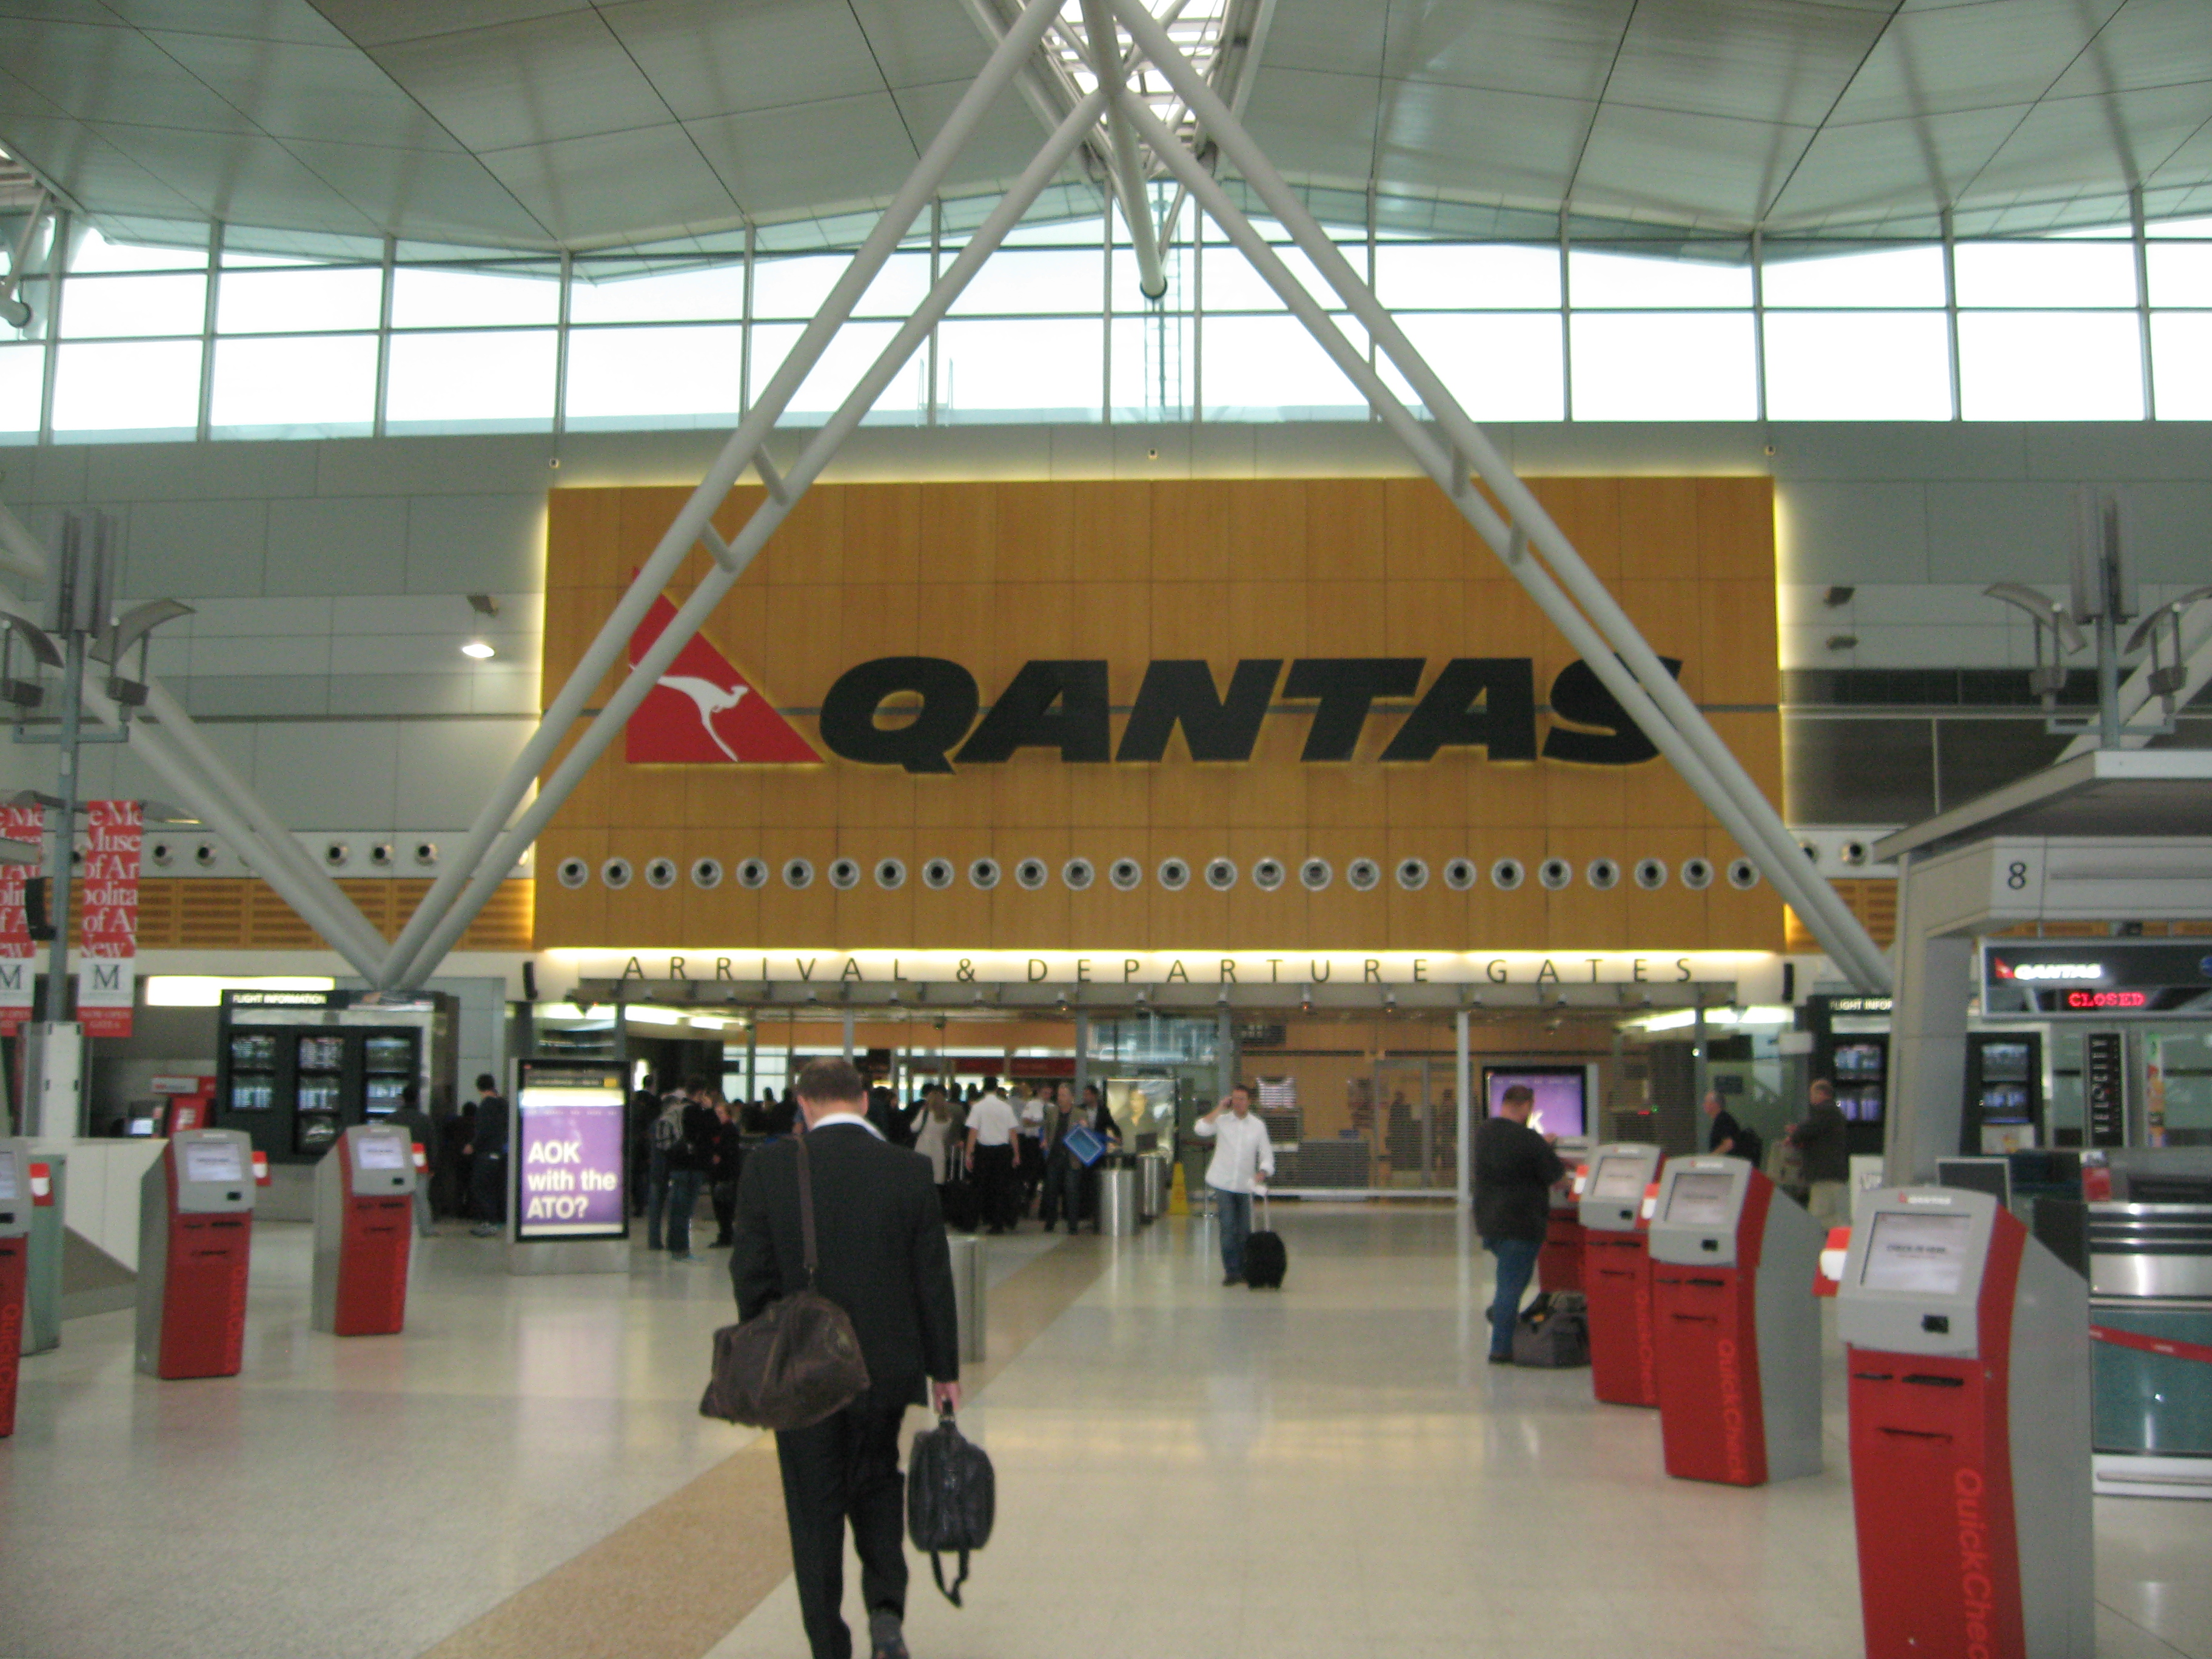 sydney airport - photo #30